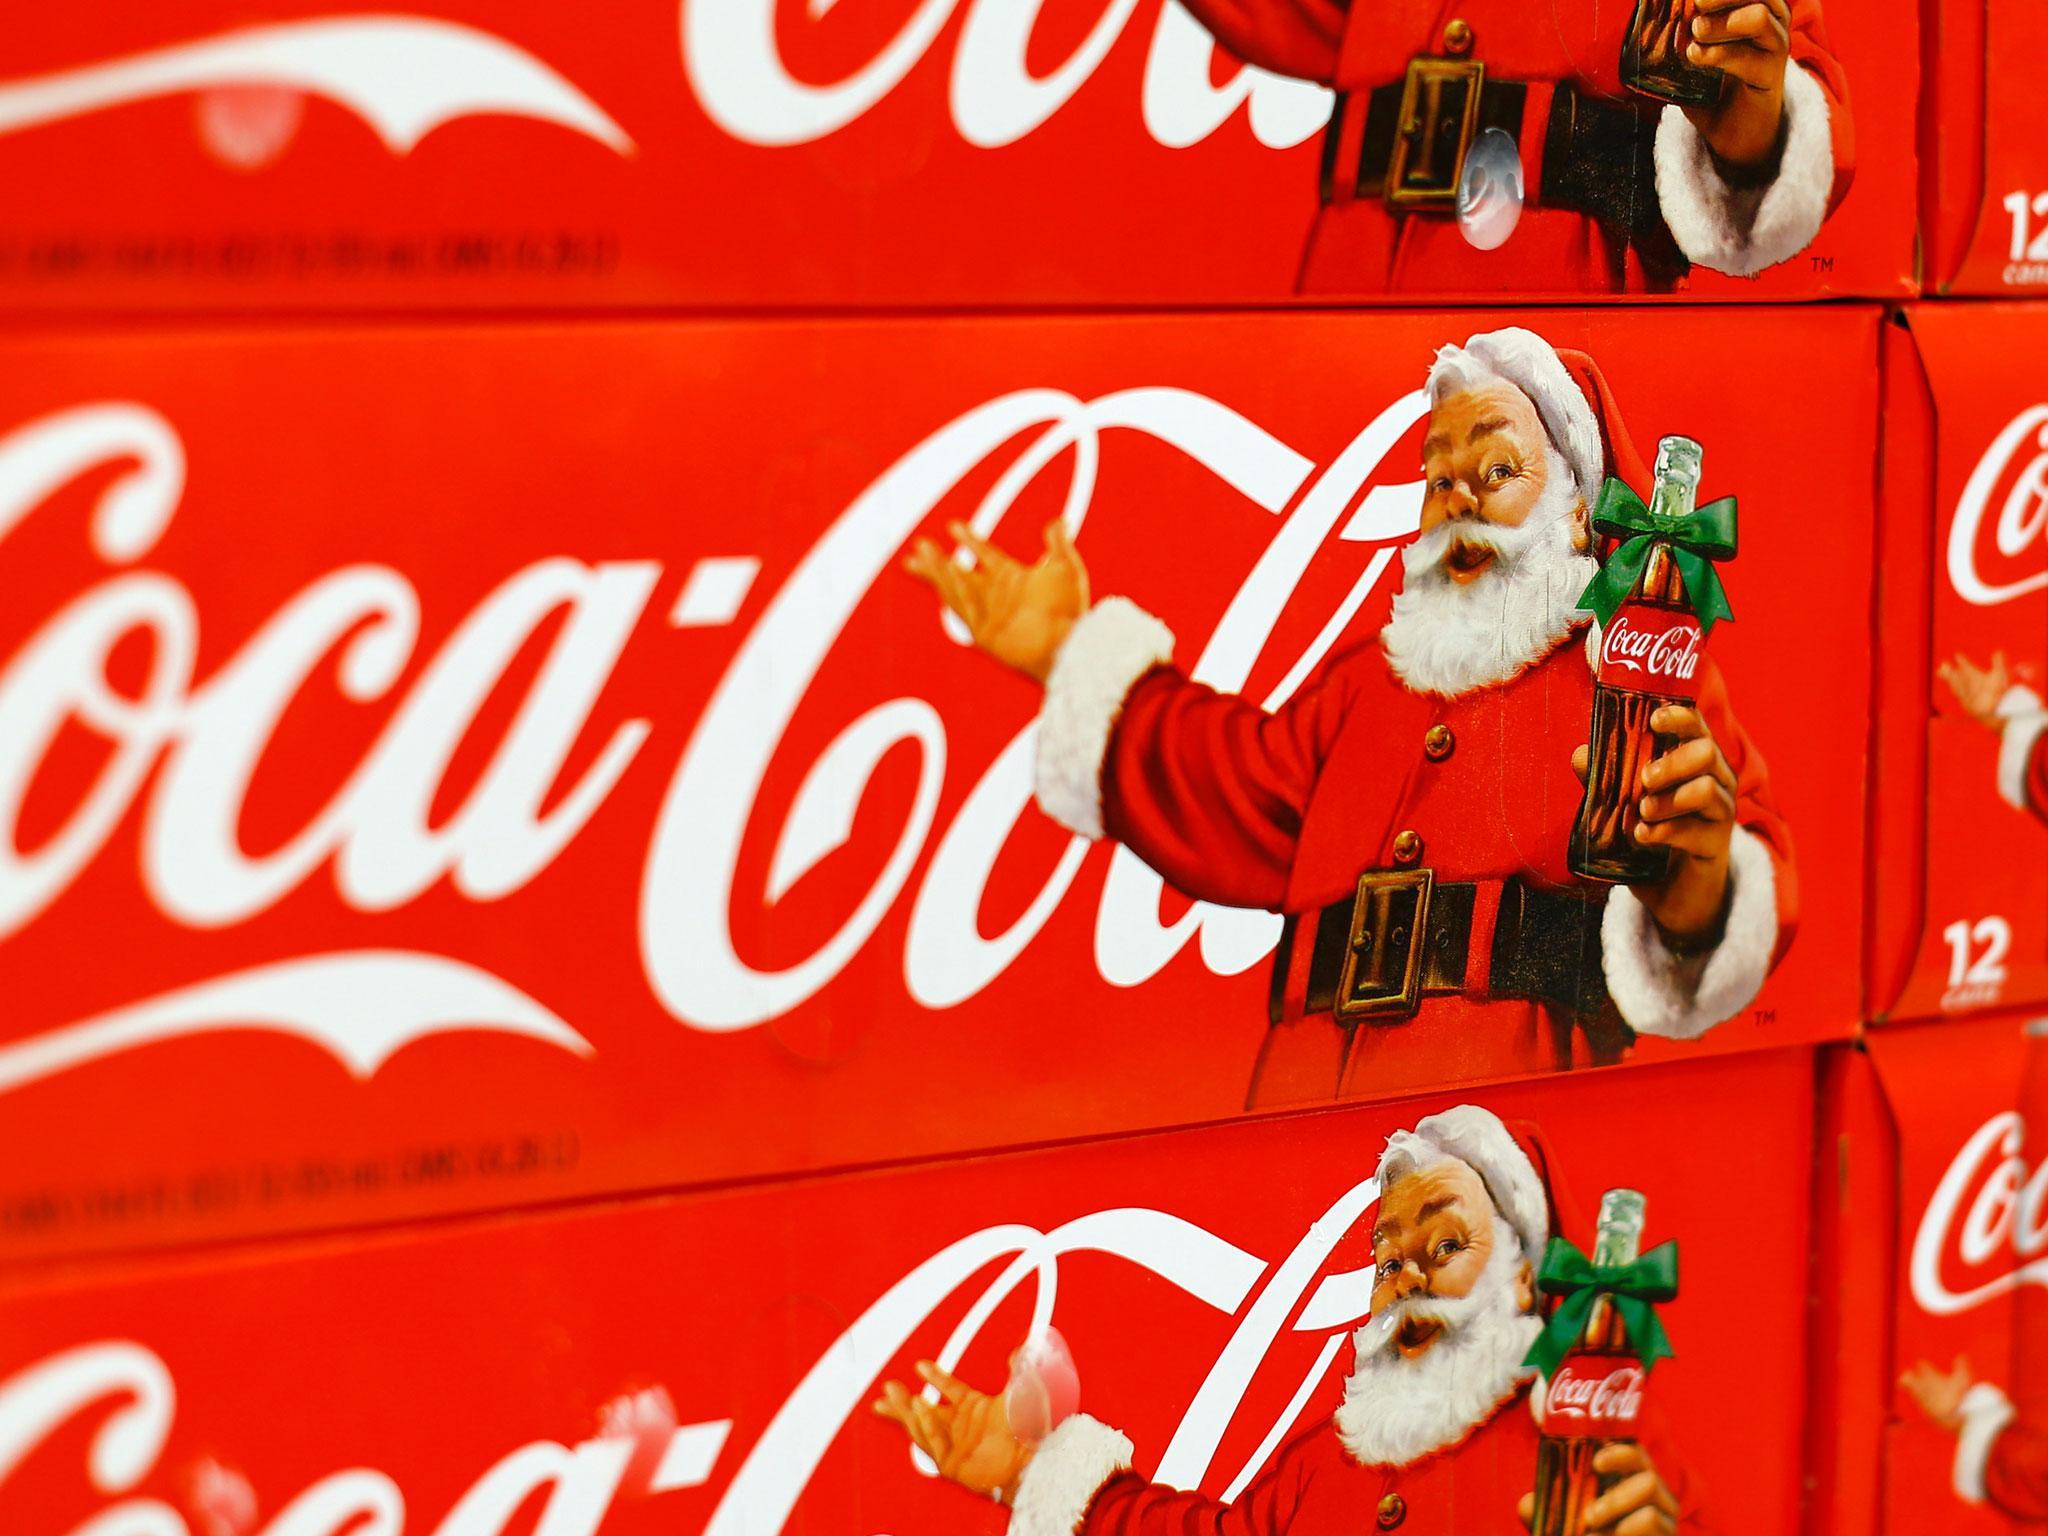 Coca Colas Christmas Lorry Tour Should Be Banned For False